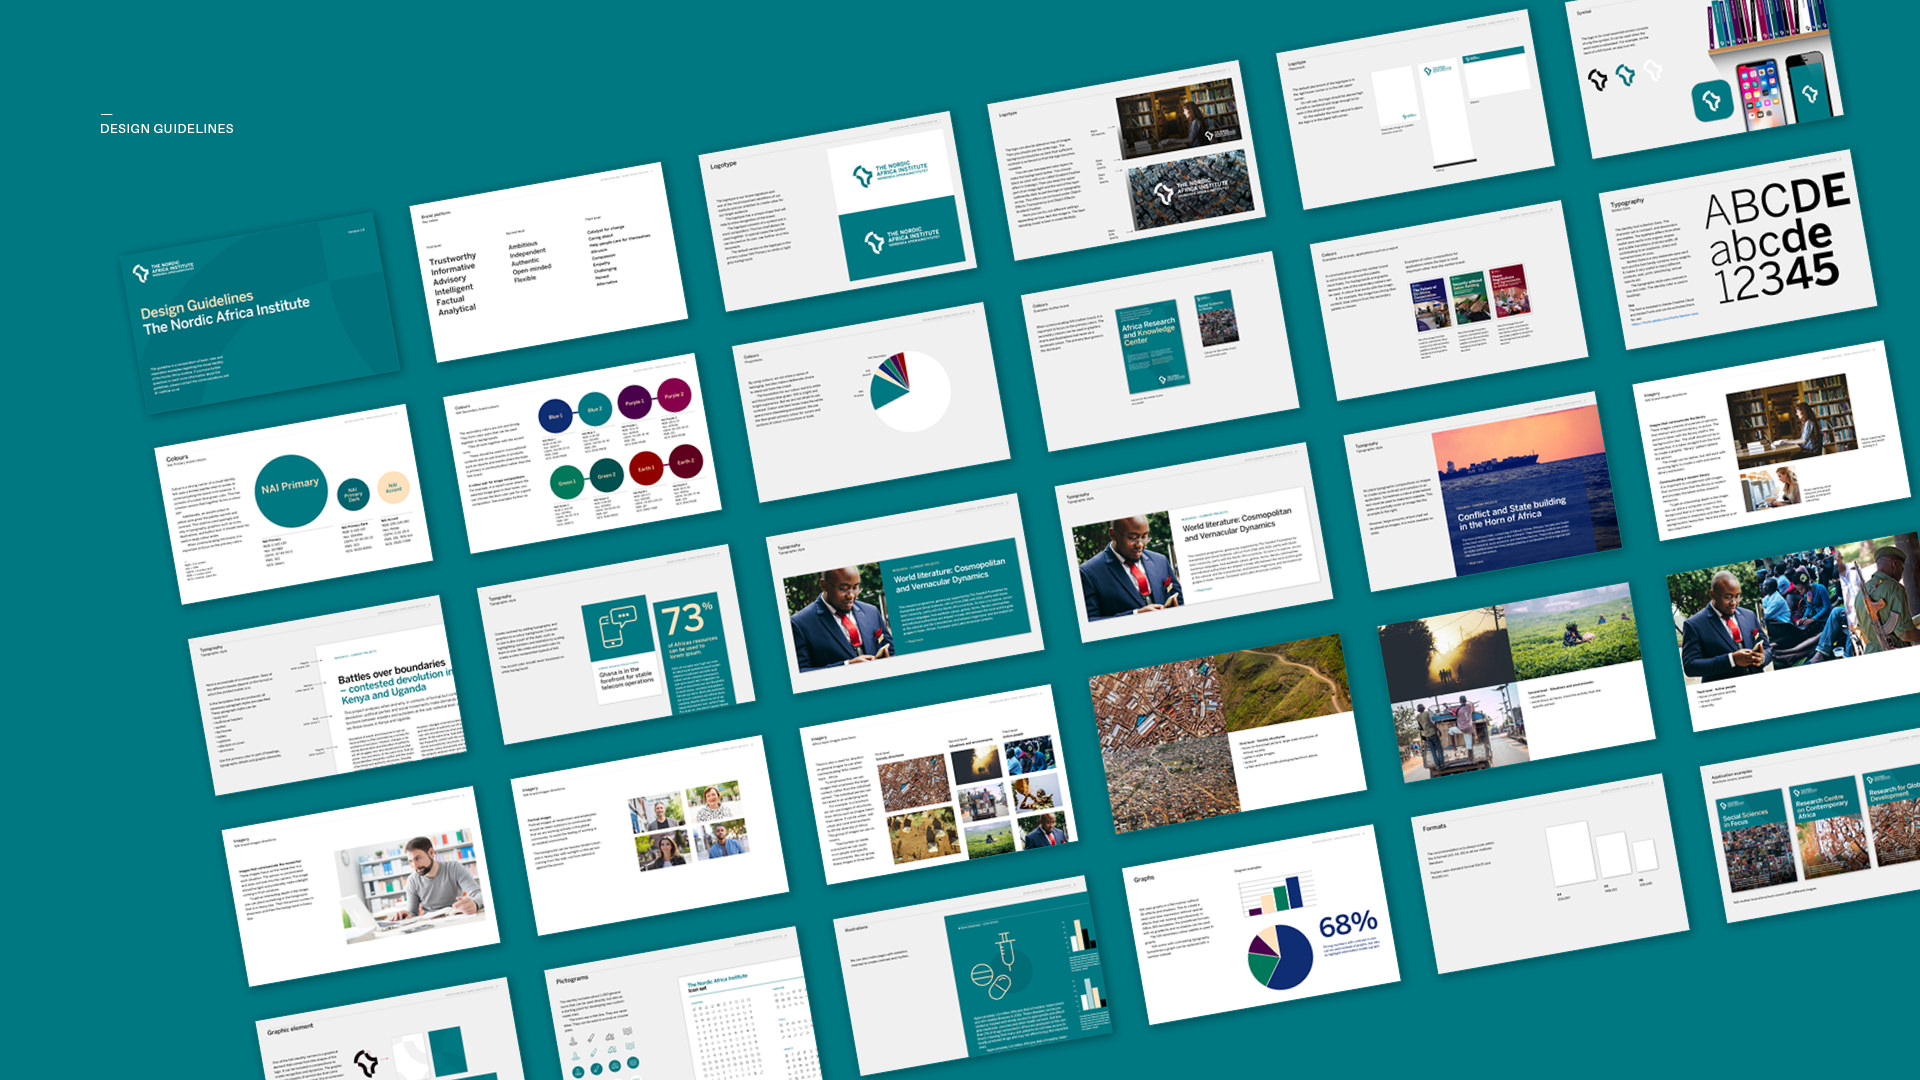 design_guidelines_nai